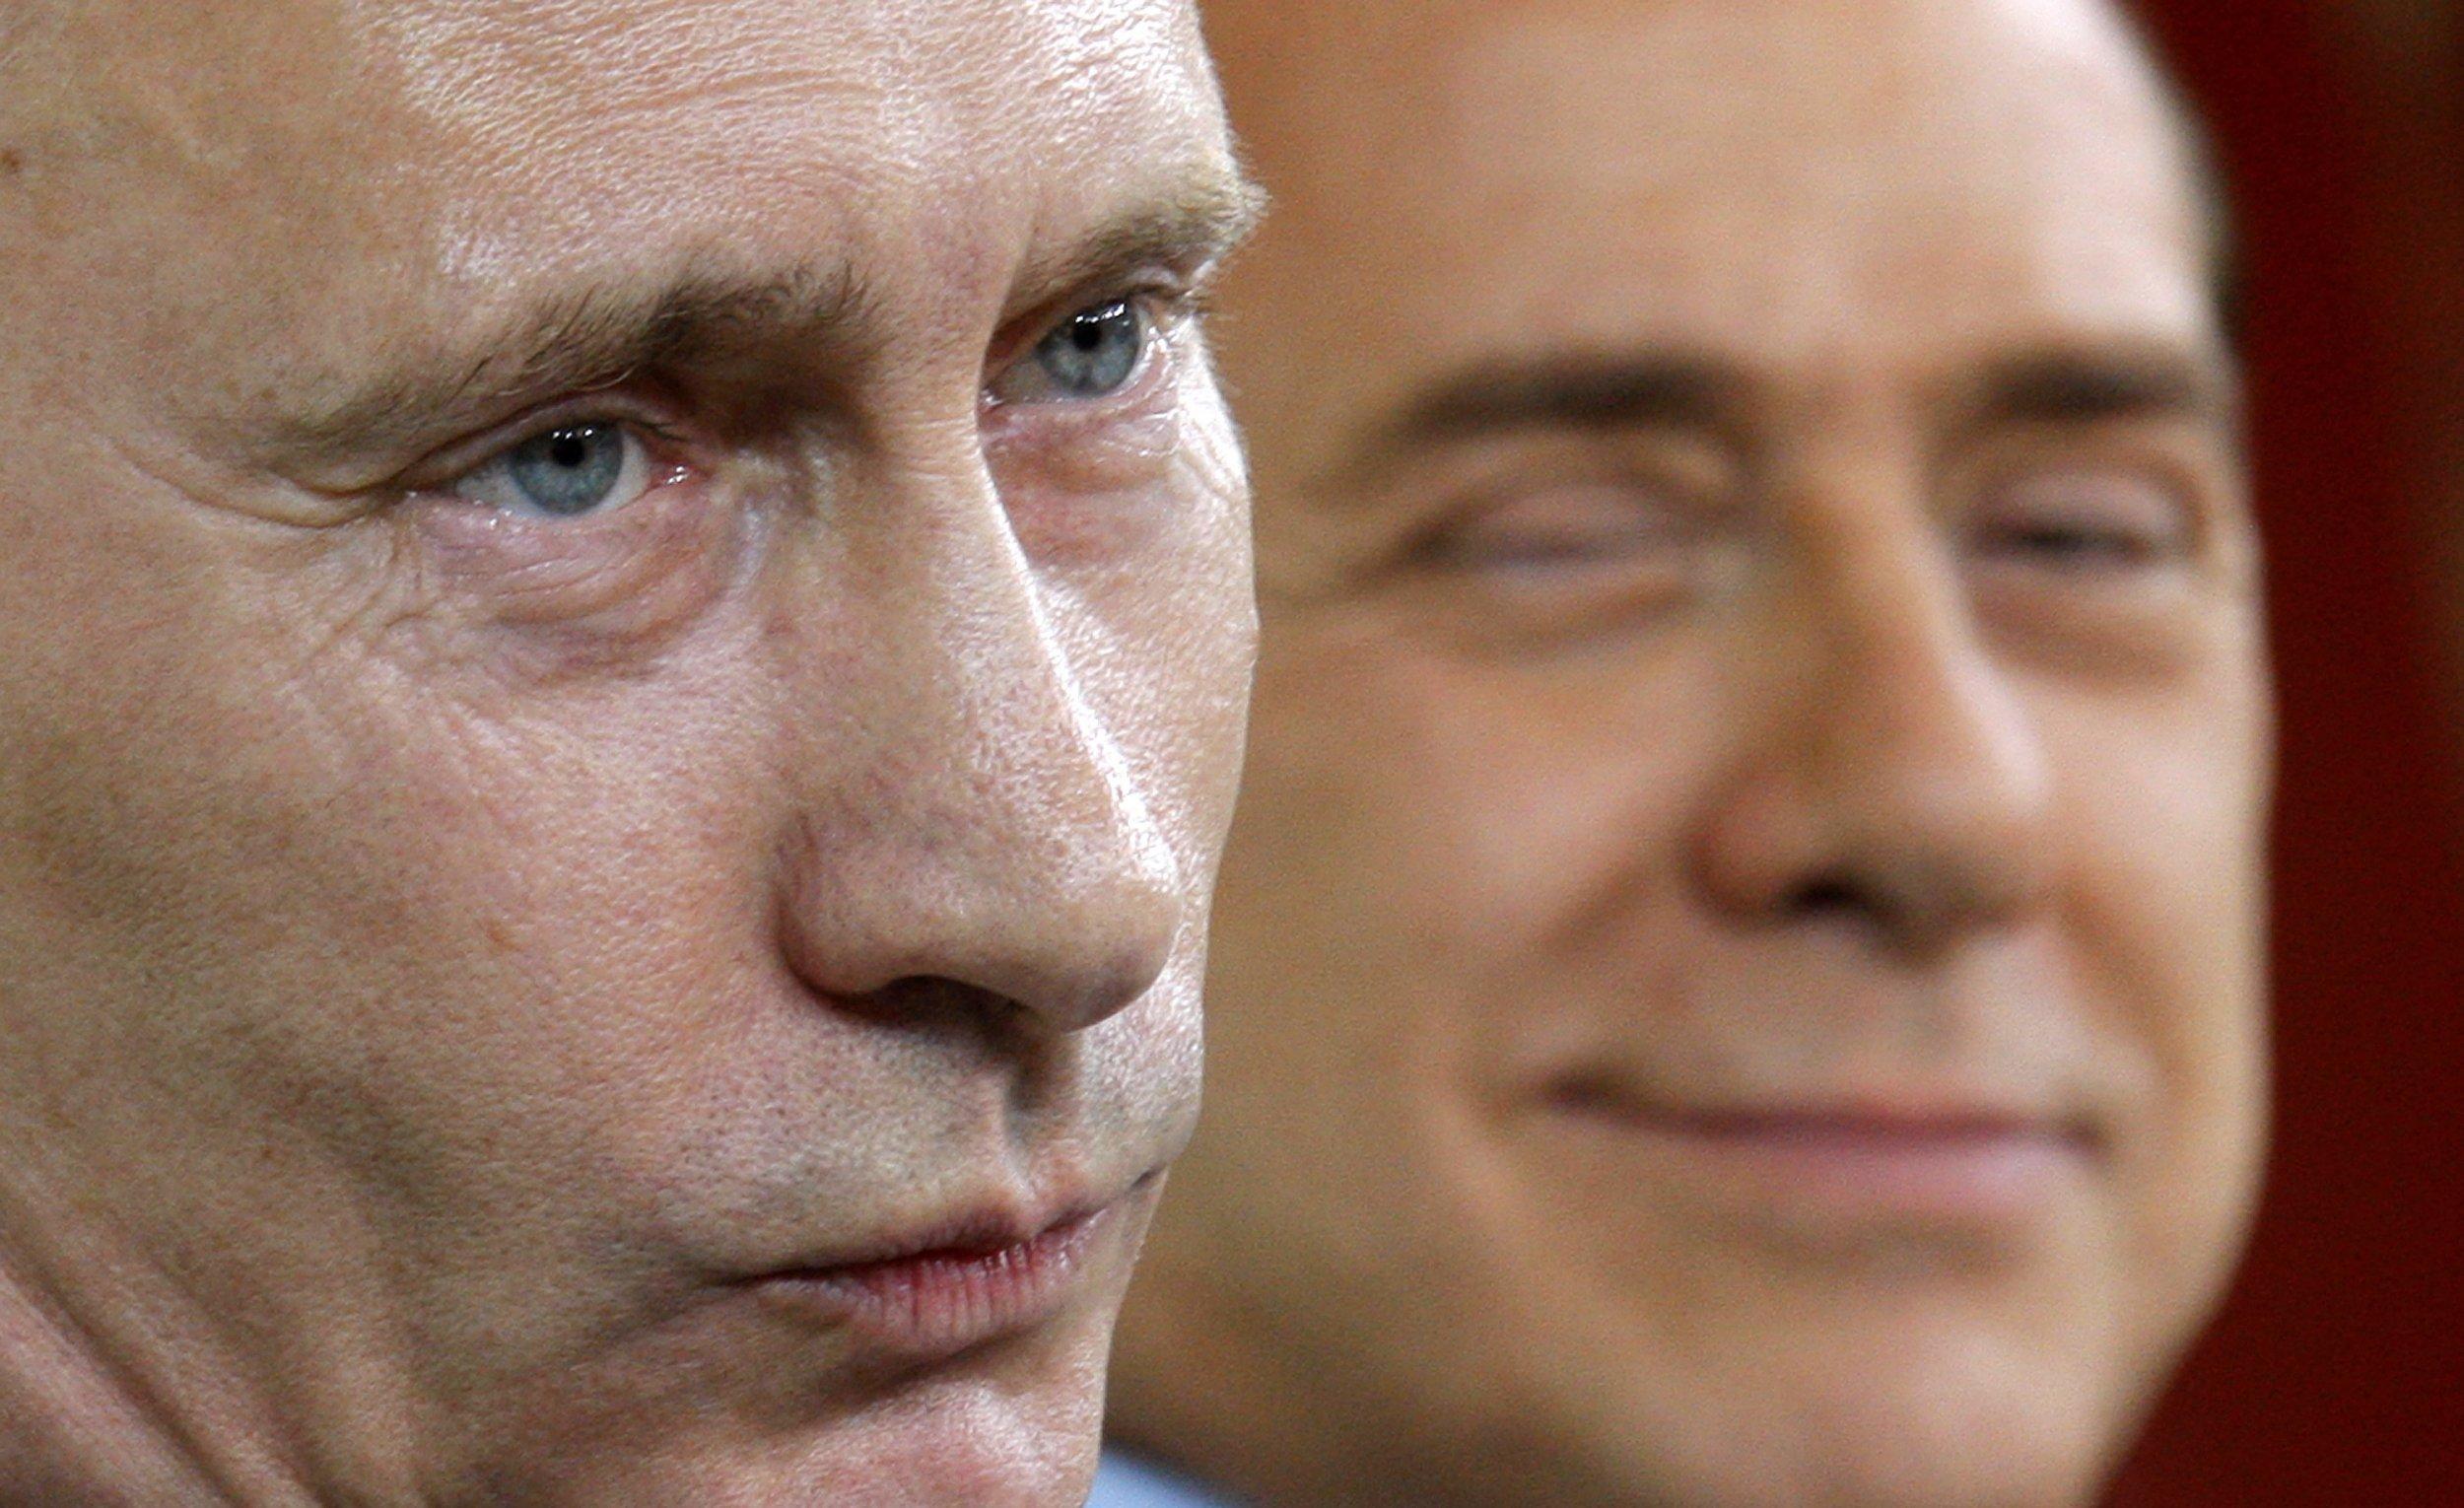 10_21_Berlusconi_Trump_01